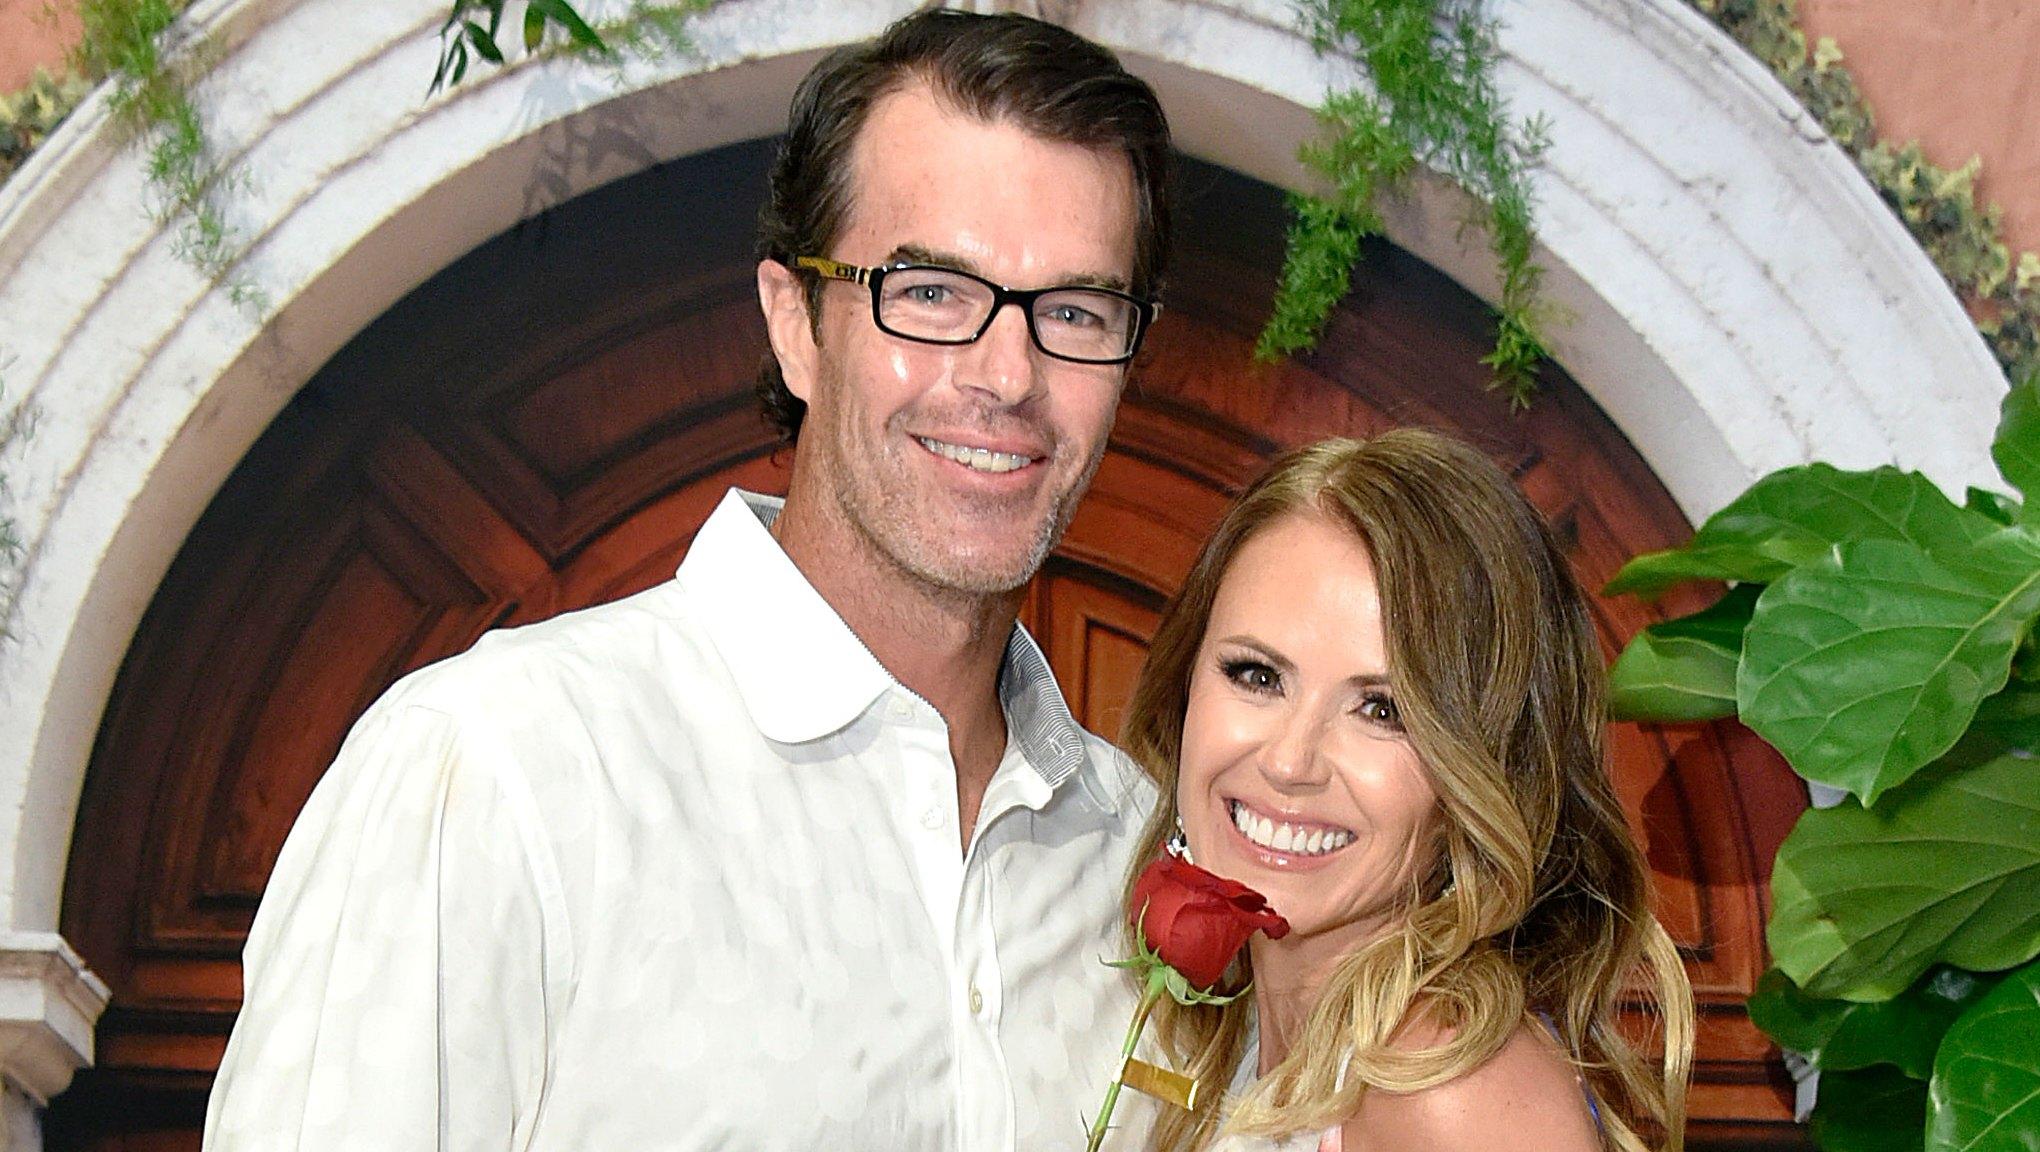 Trista Sutter Ryan Sutter Hope Their Kids Aren't Scarred Watching The Bachelor